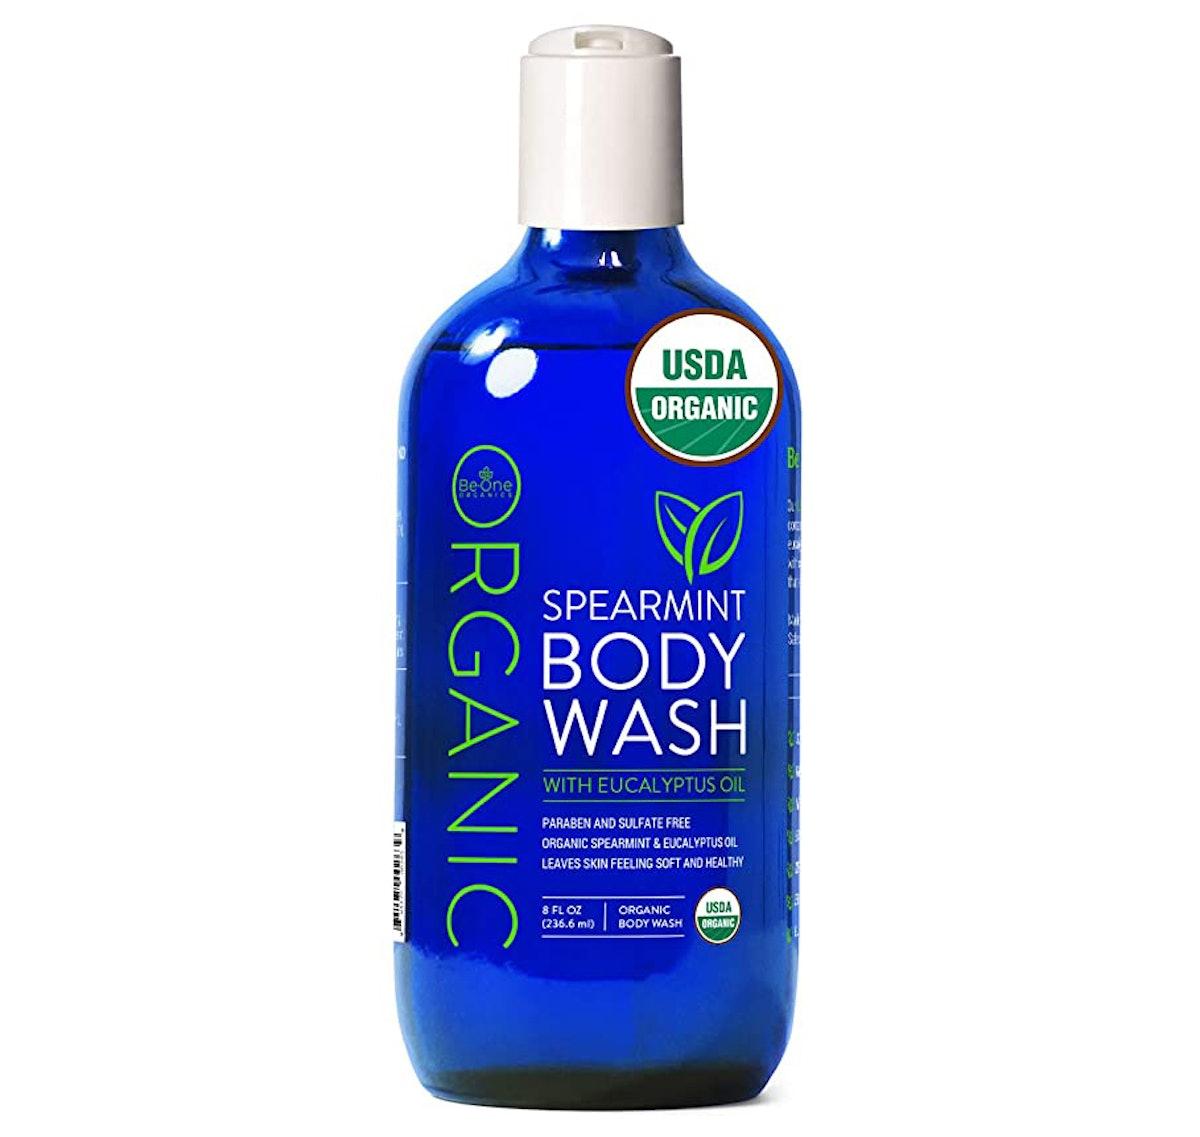 Be-One Organic Spearmint Body Wash